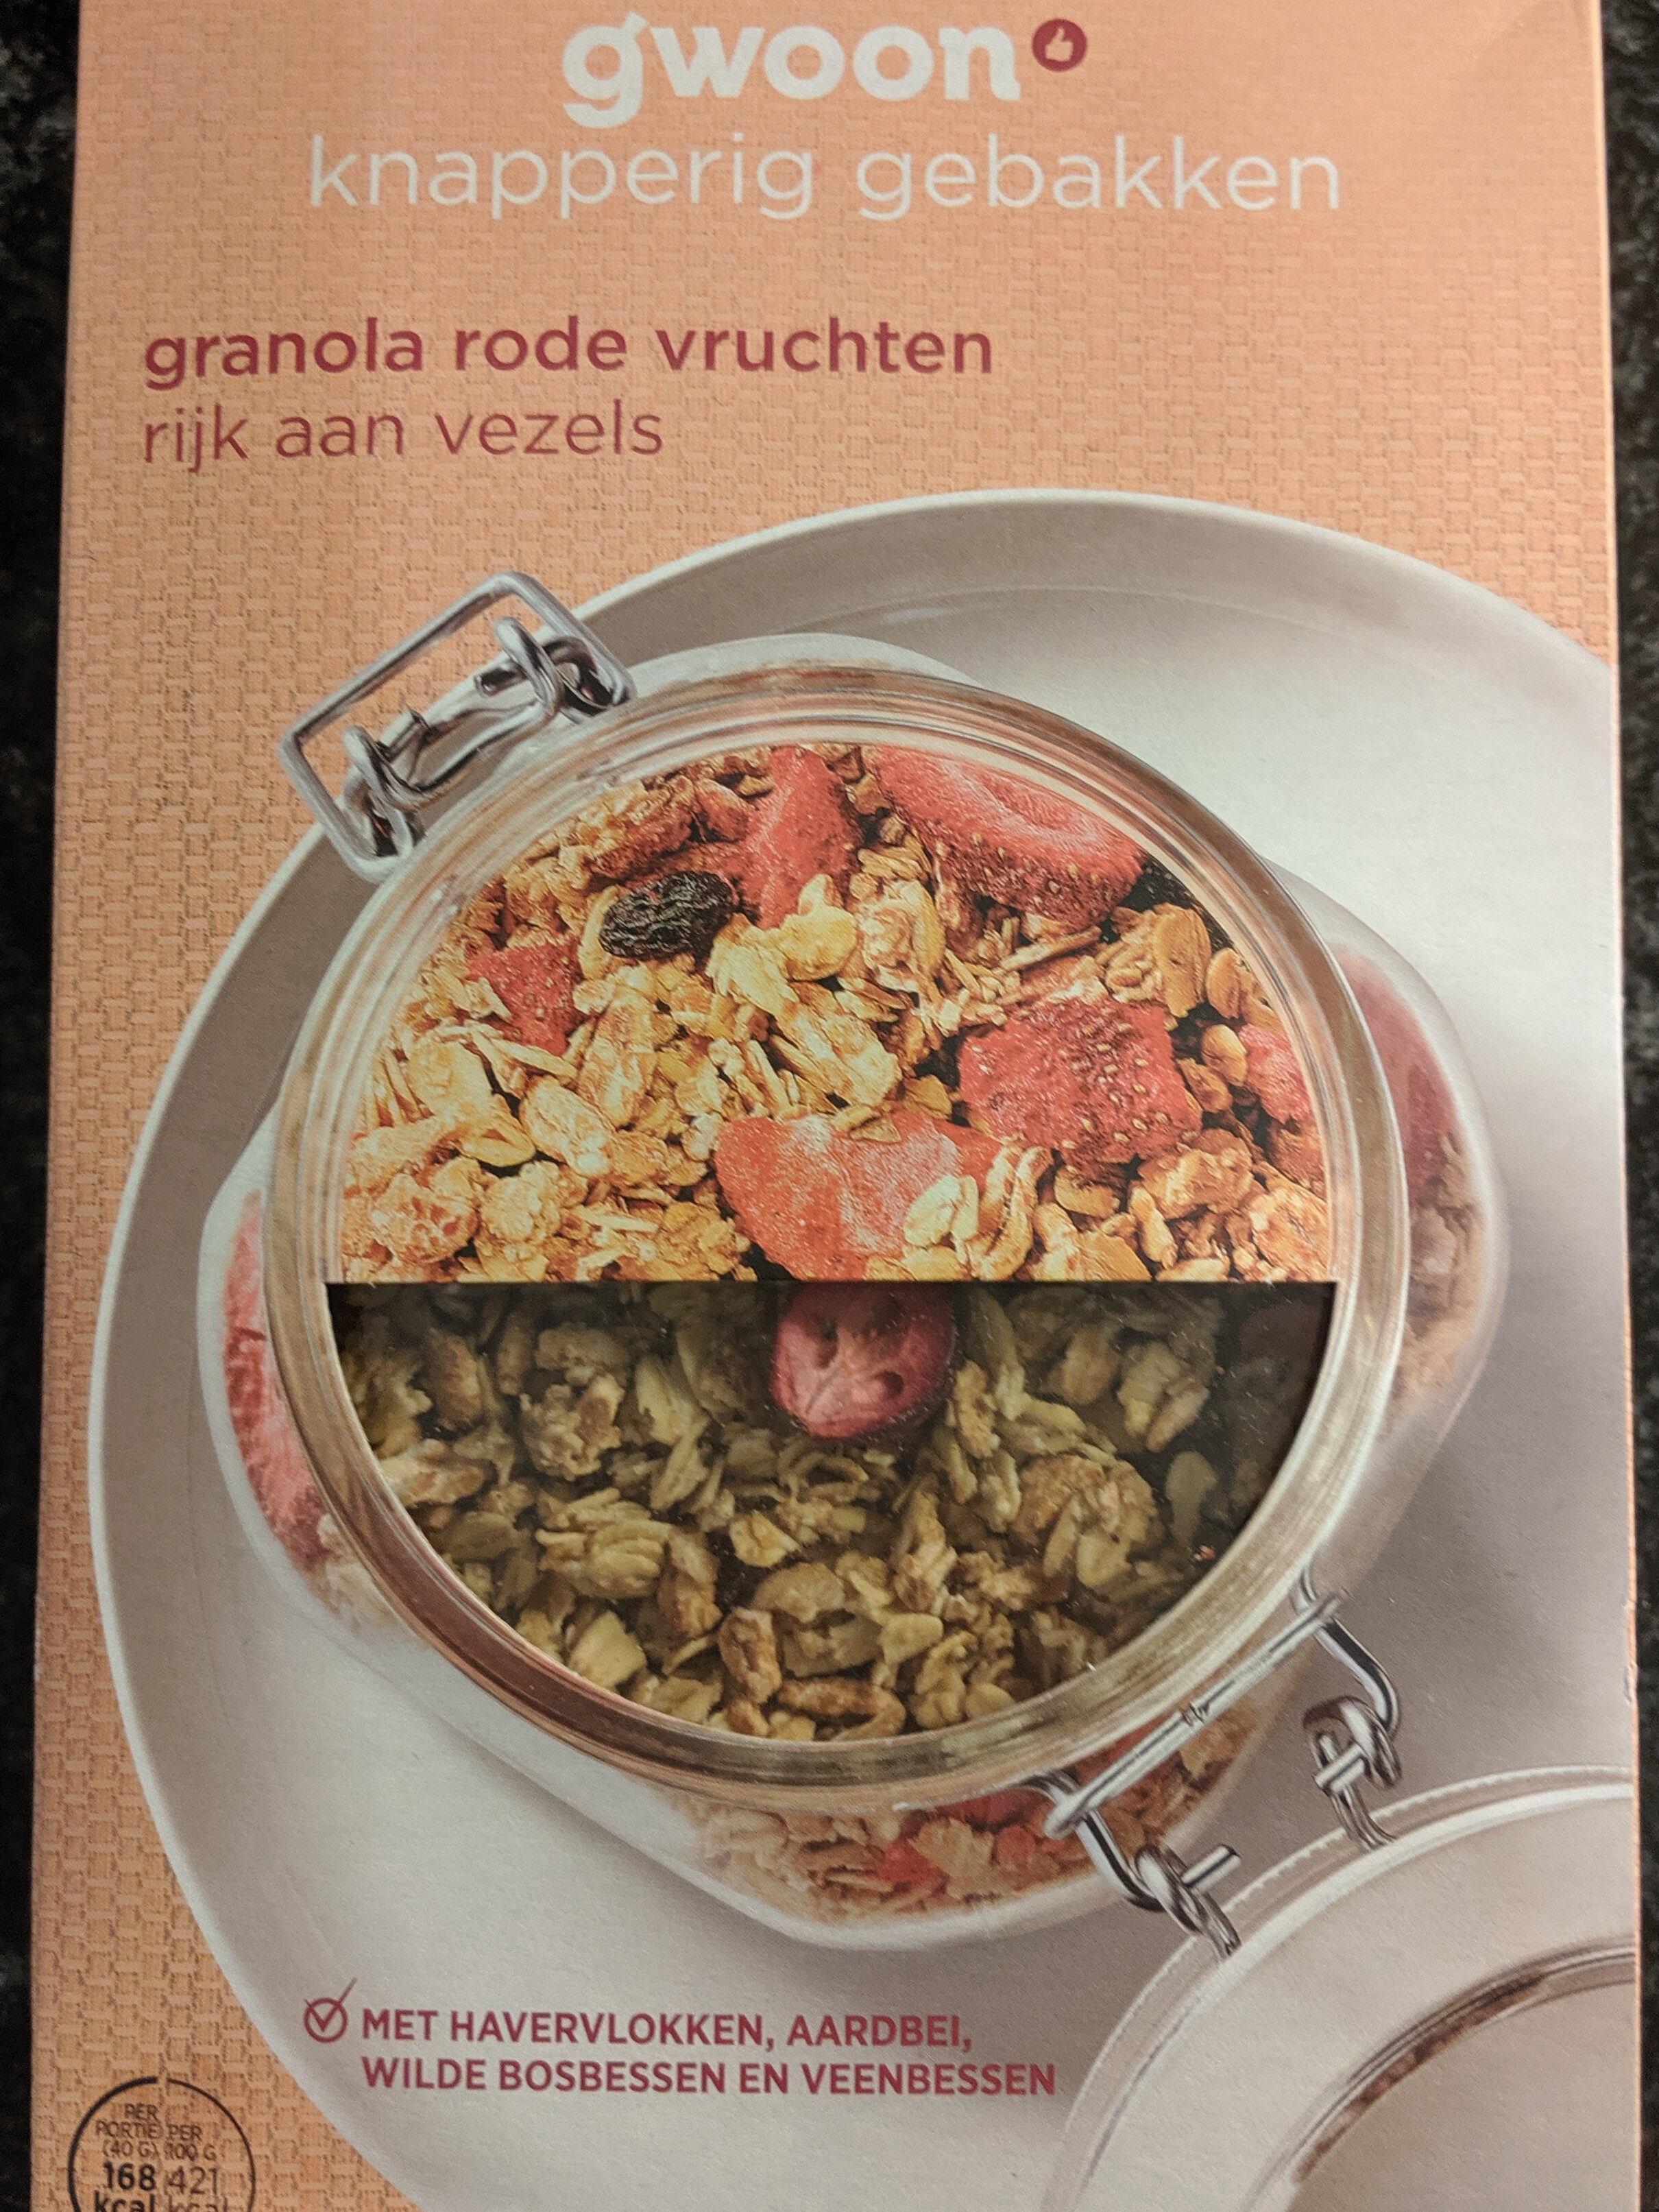 Granola rode vruchten - Product